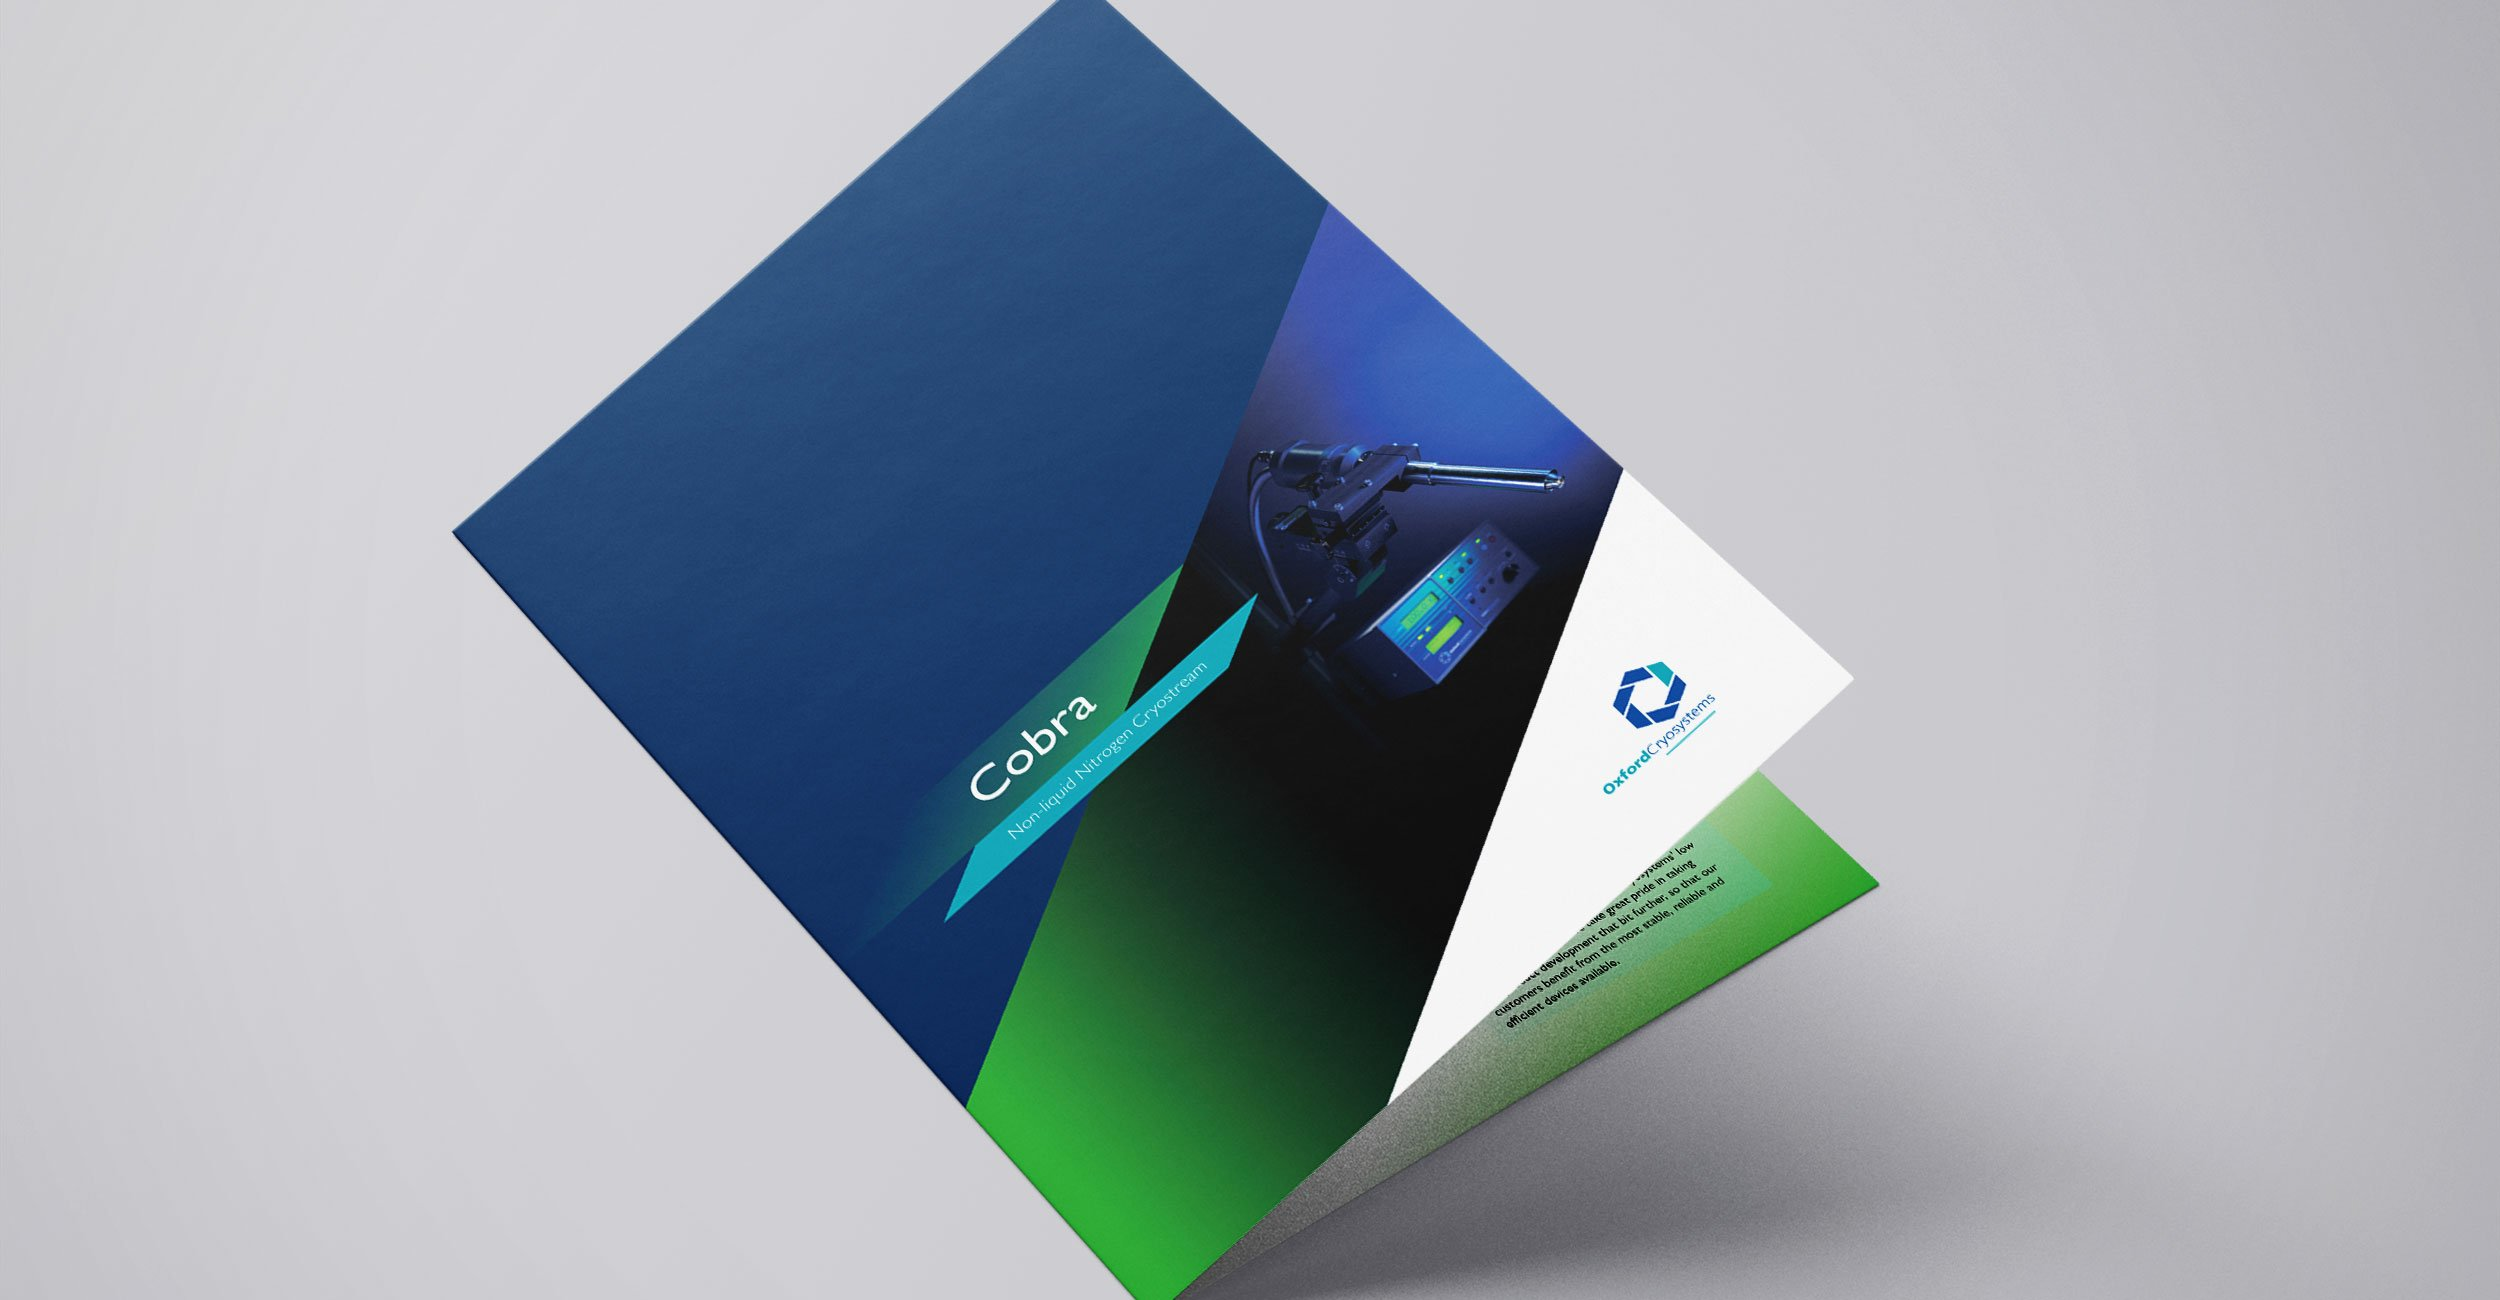 Oxford Cryosystems Brochure Design